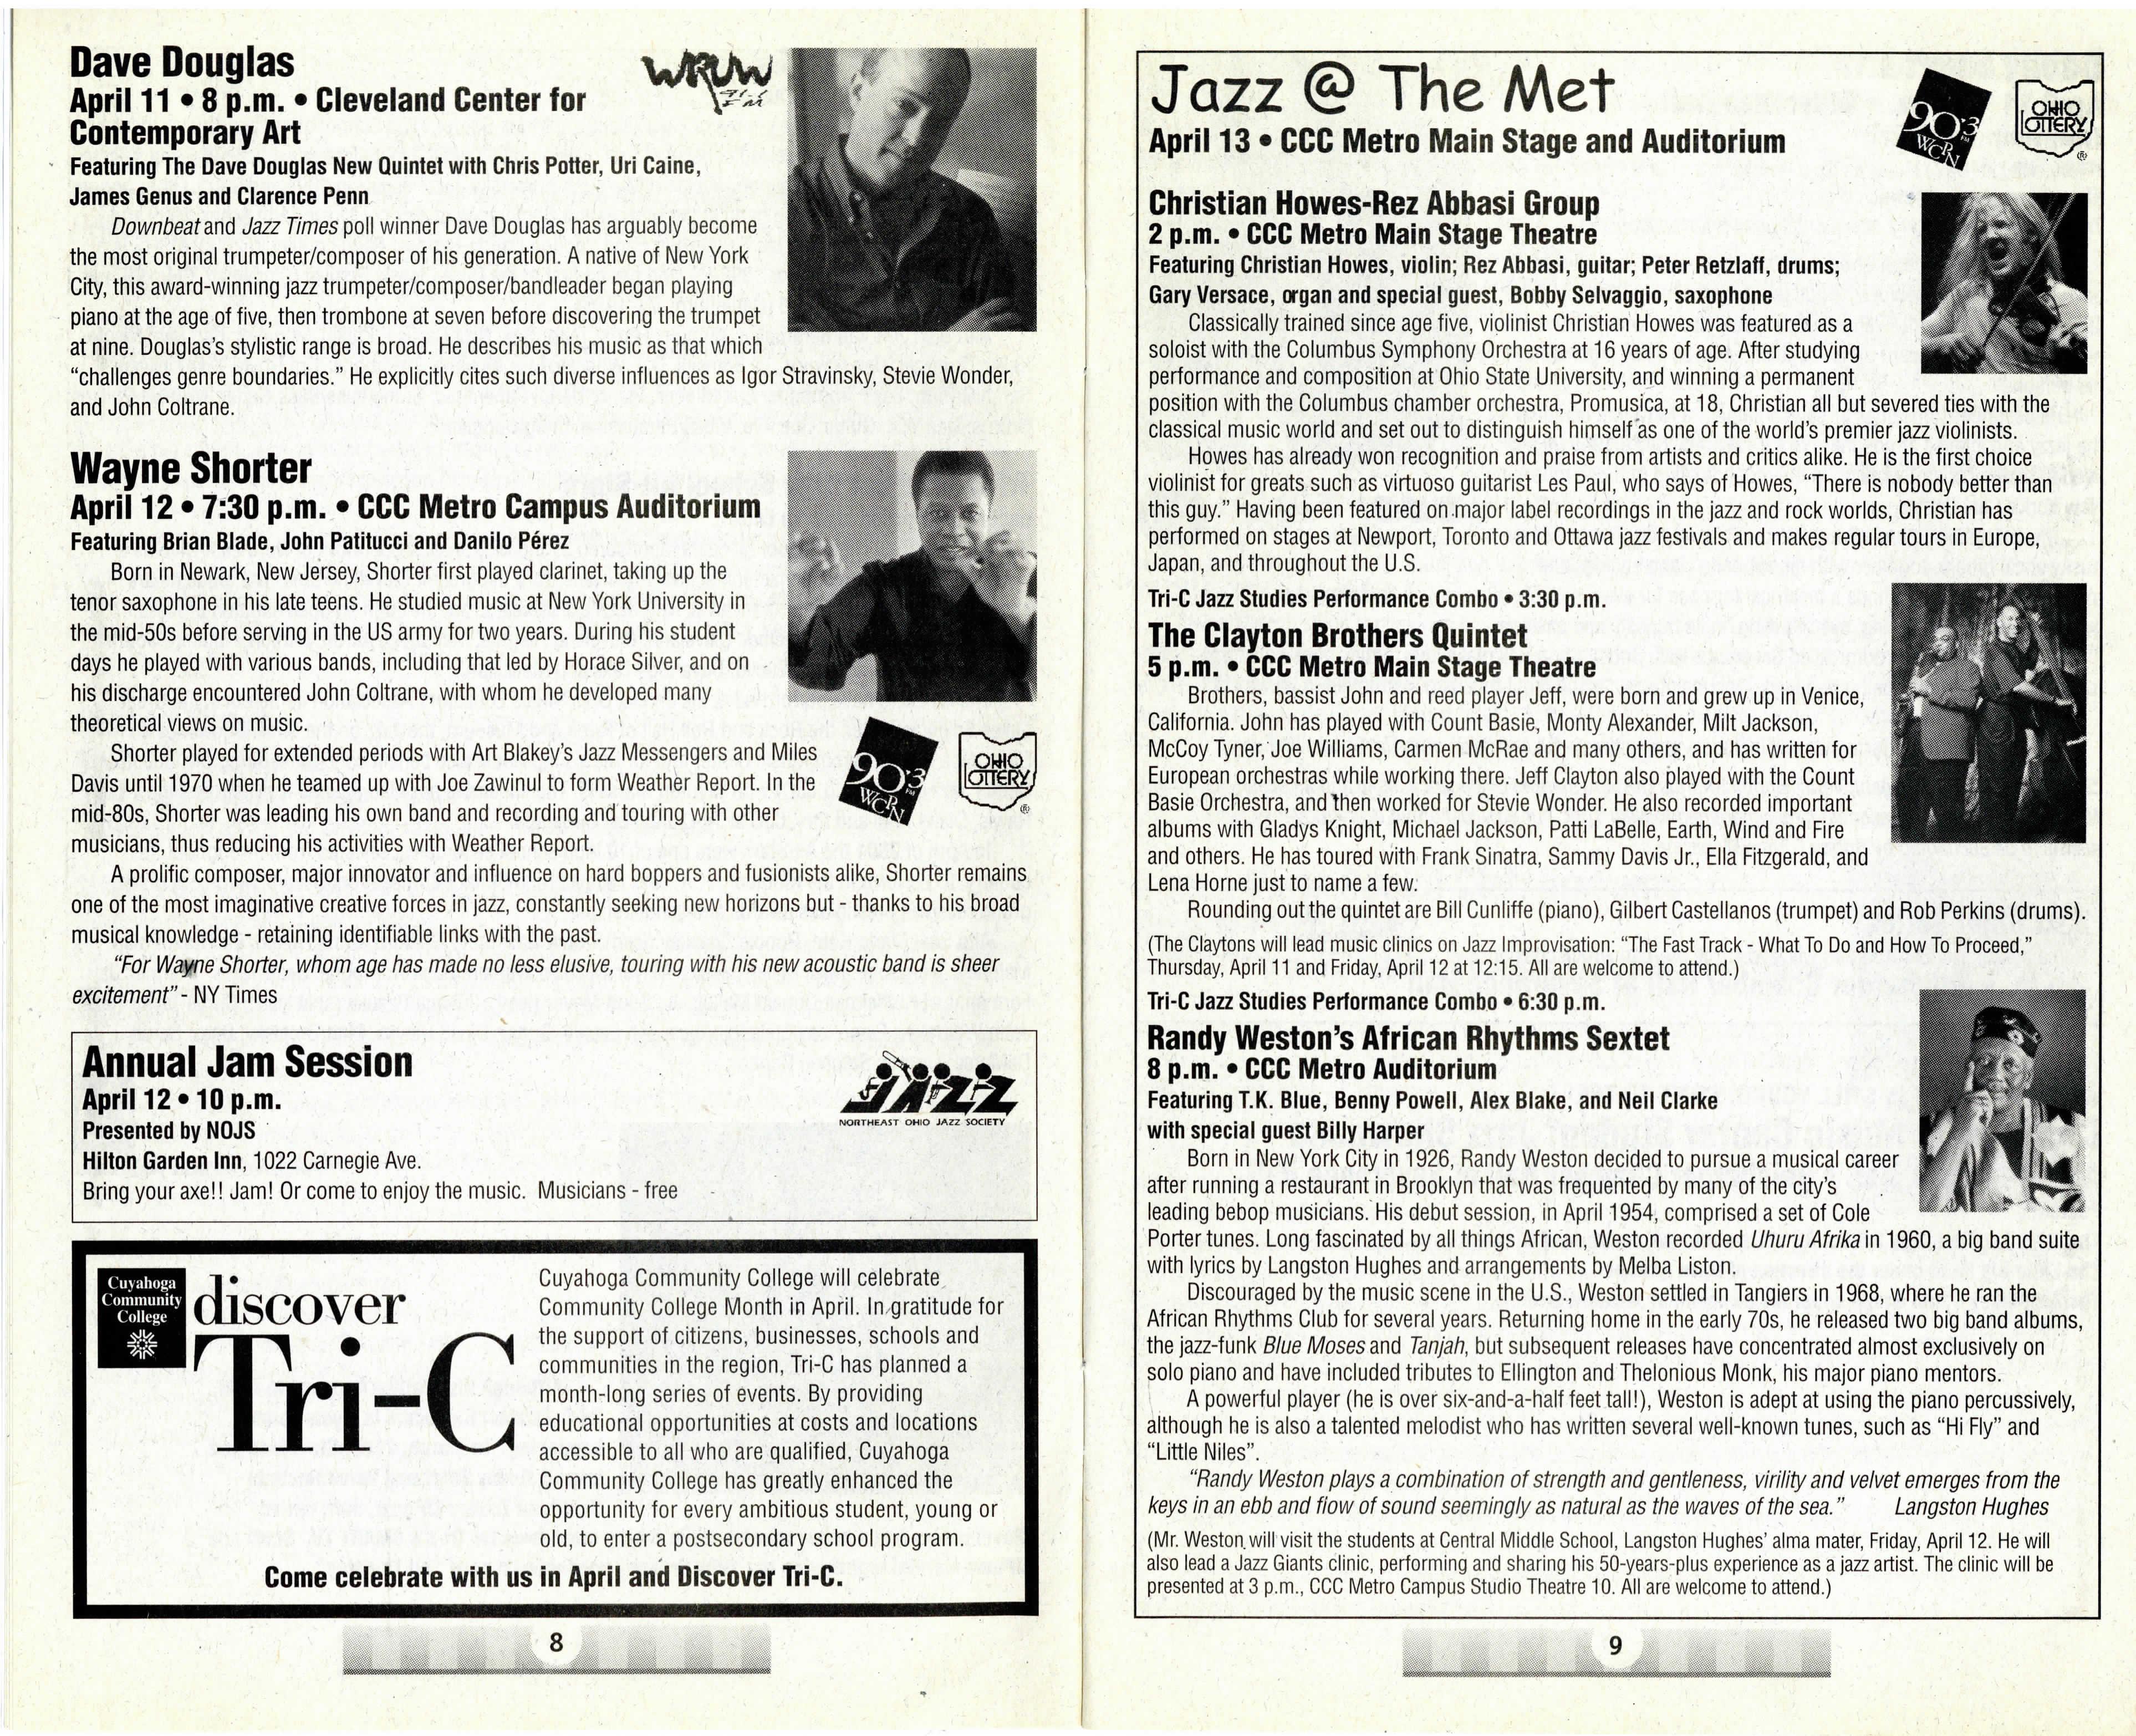 Wayne Shorter Program Bio